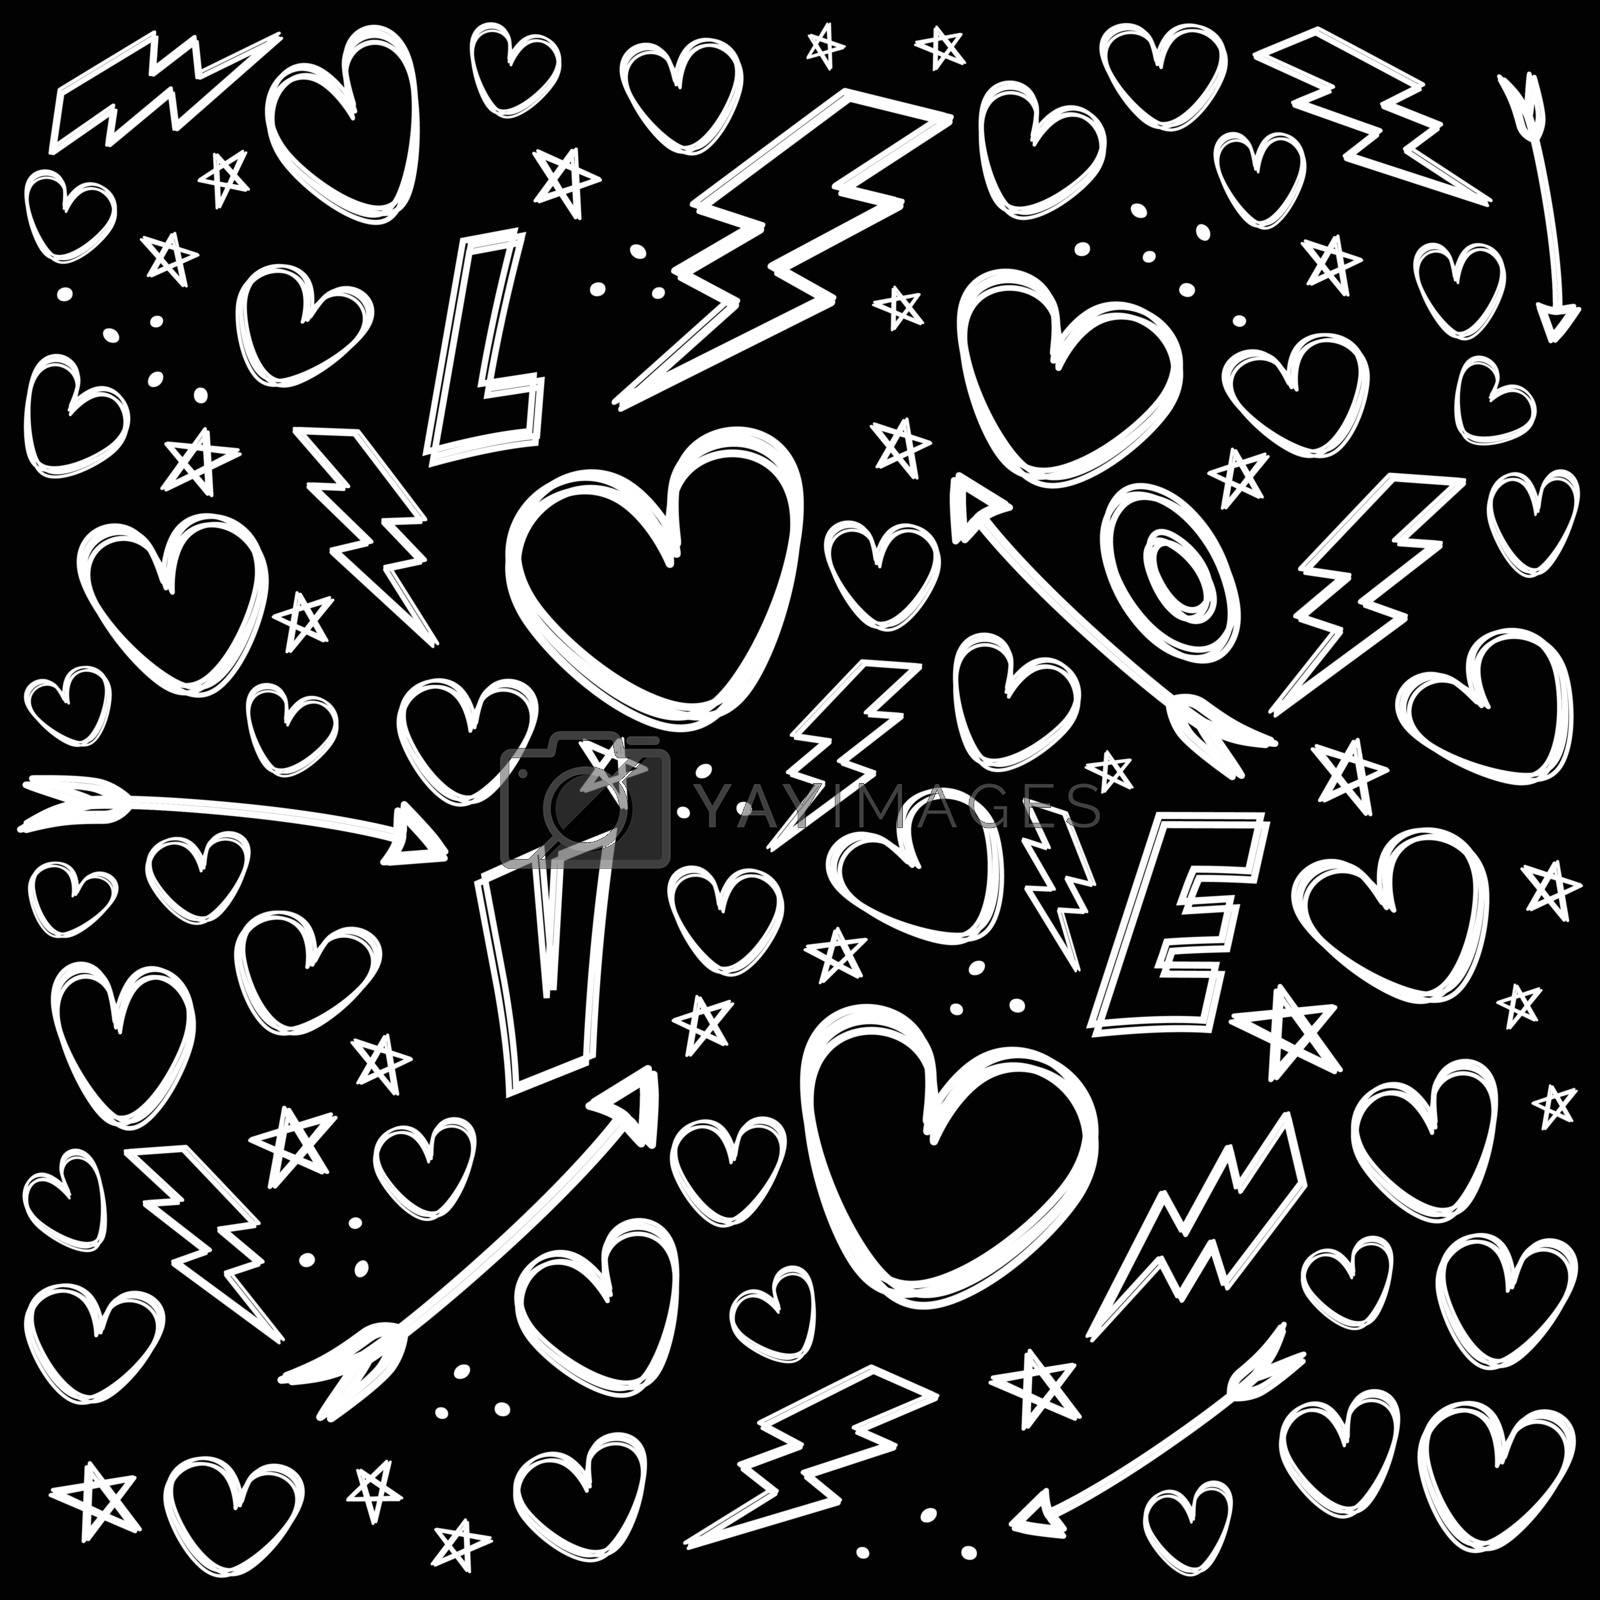 romance theme vanlentines day vector art illustration